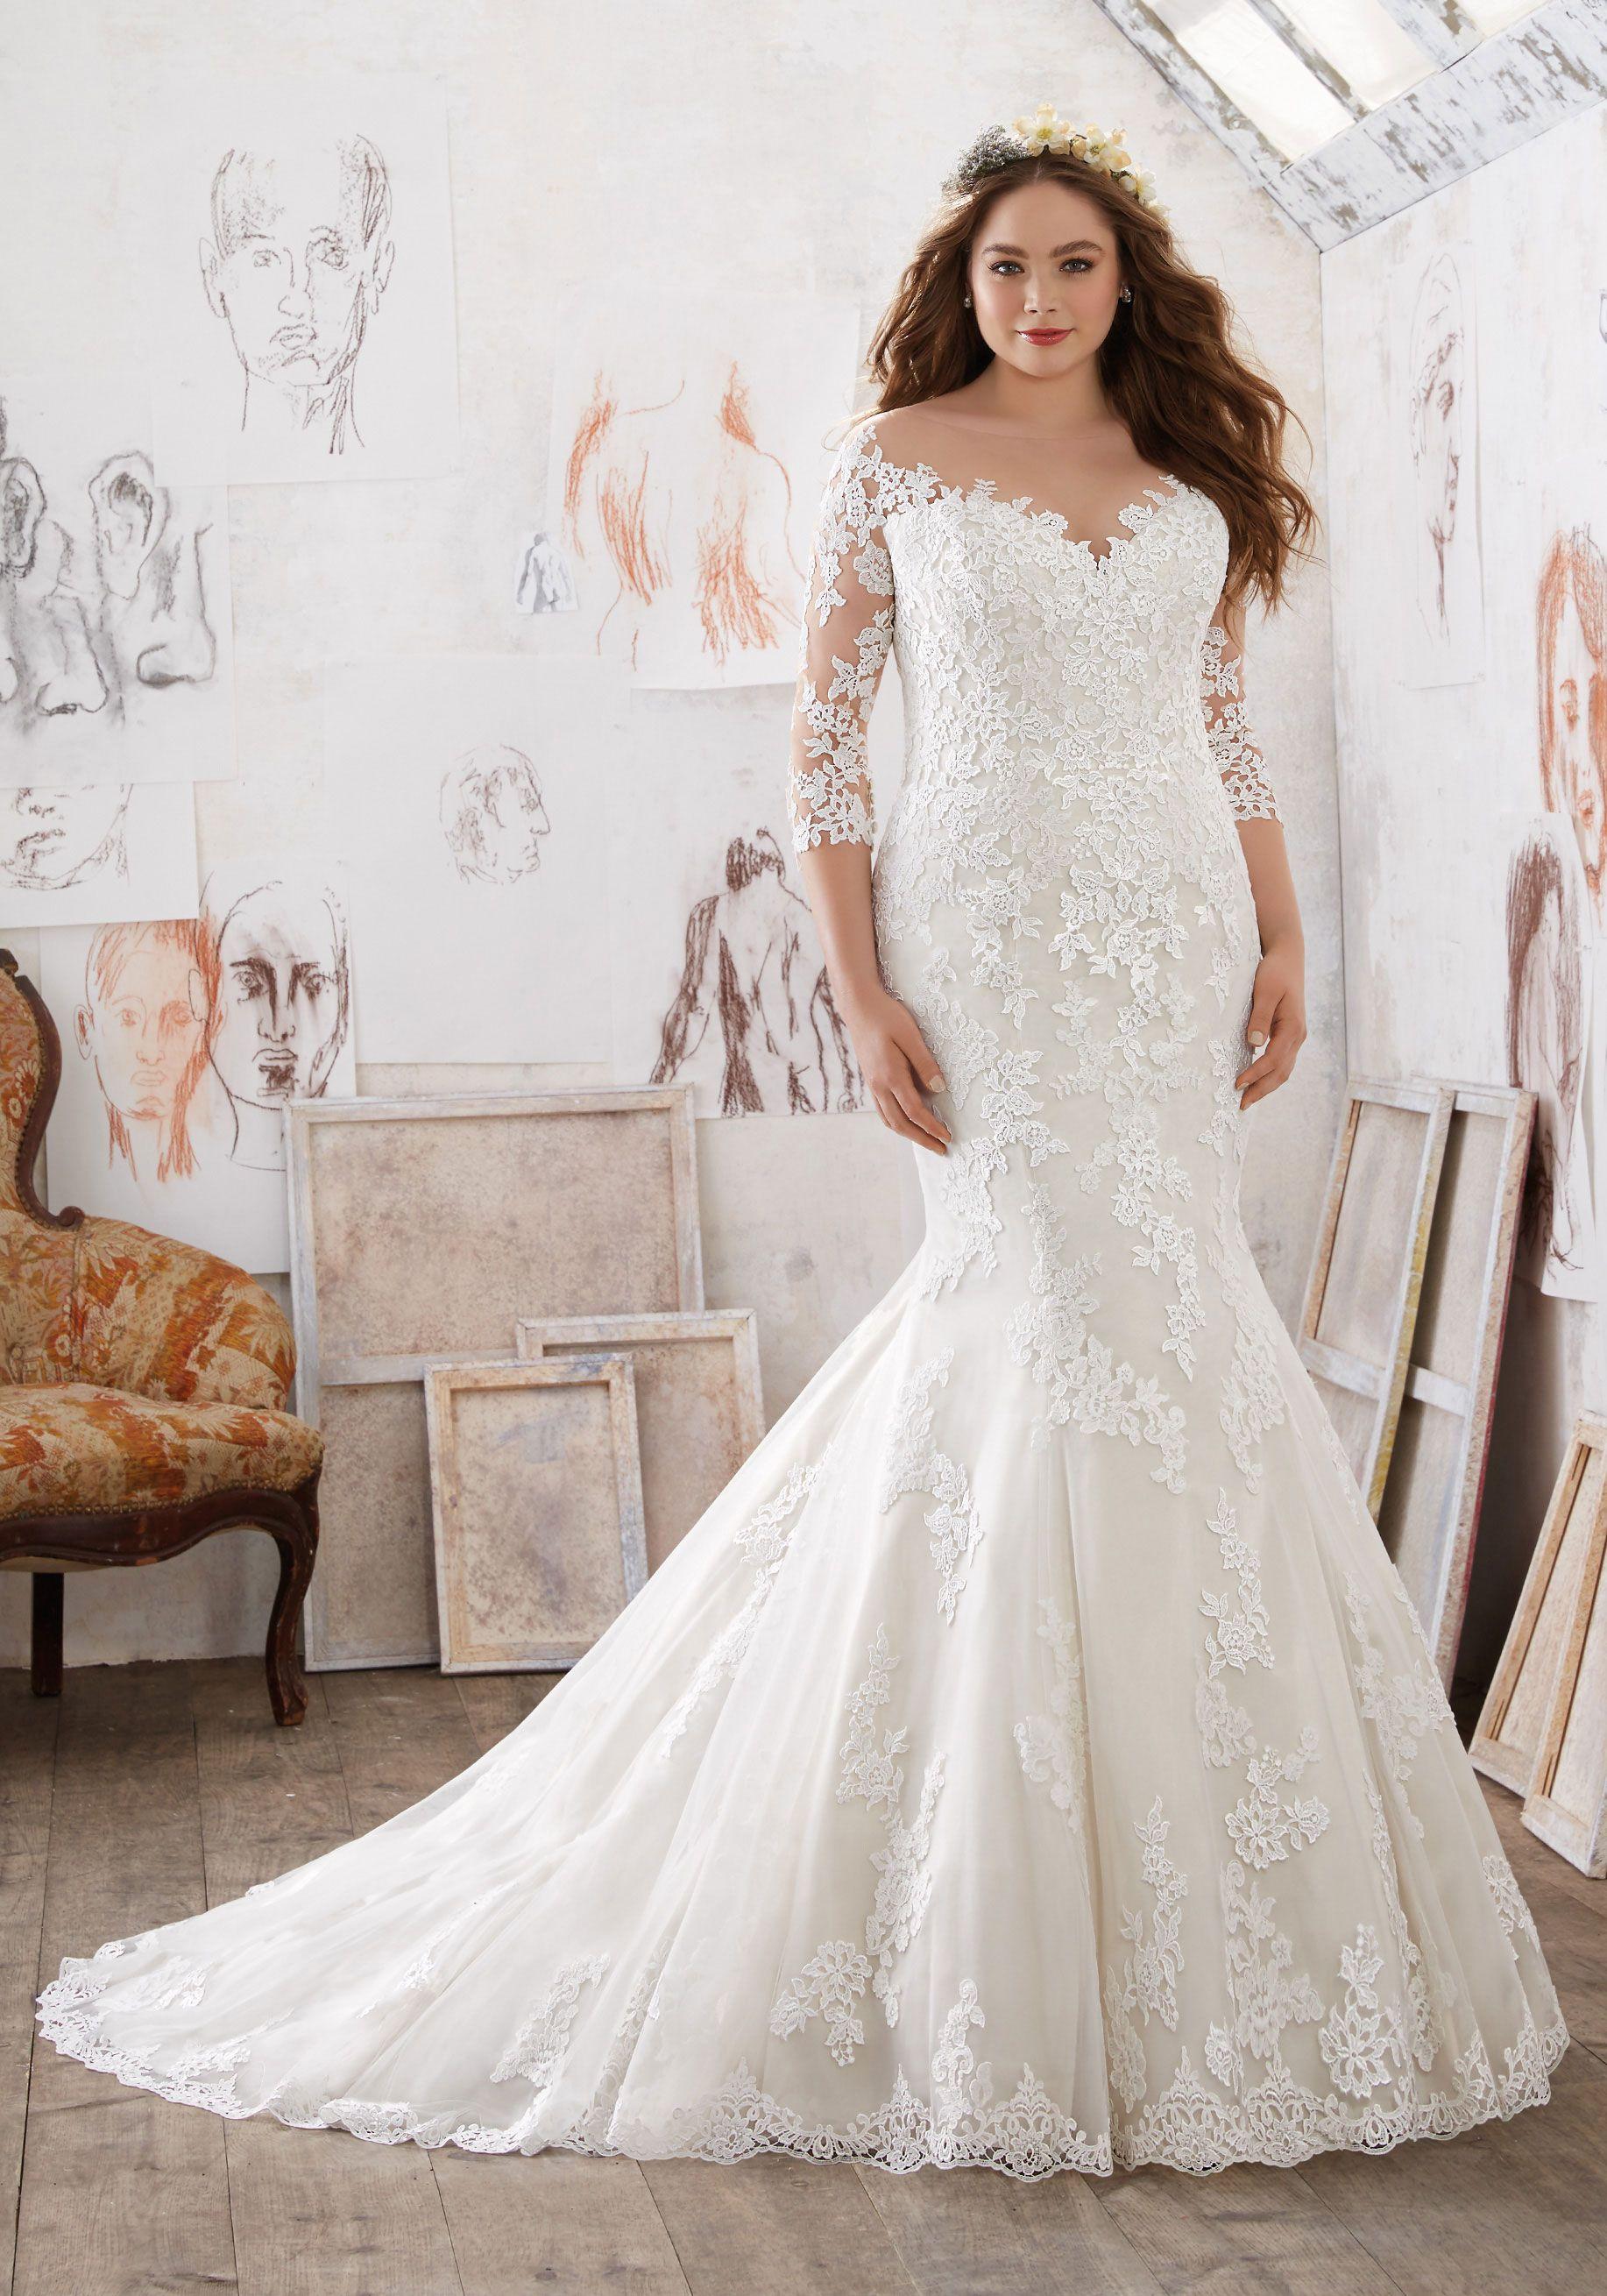 Mia Plus Size Wedding Dress Lace Weddings Wedding Dresses Plus